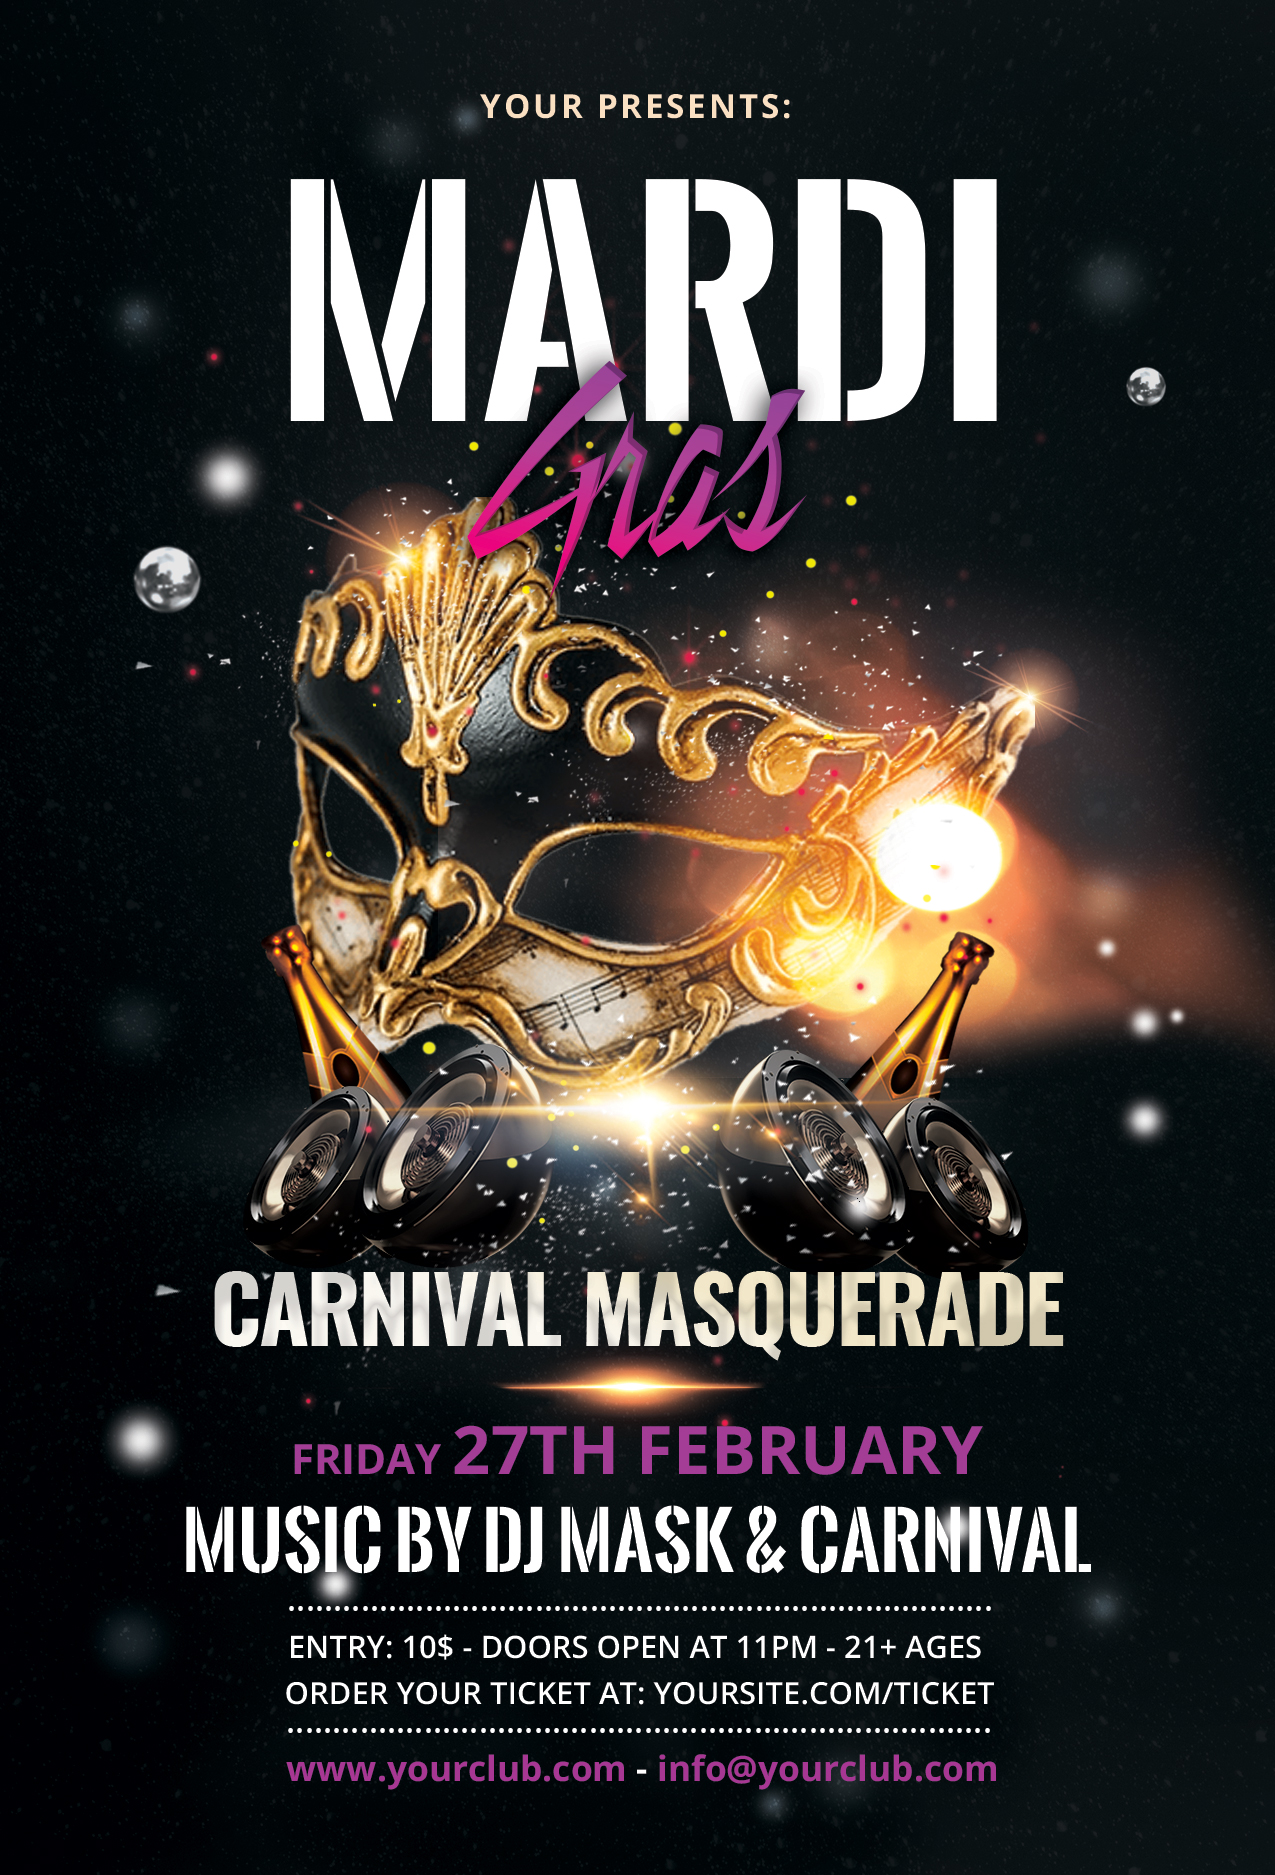 Mardi Gras Free Black & Gold PSD Flyer Template